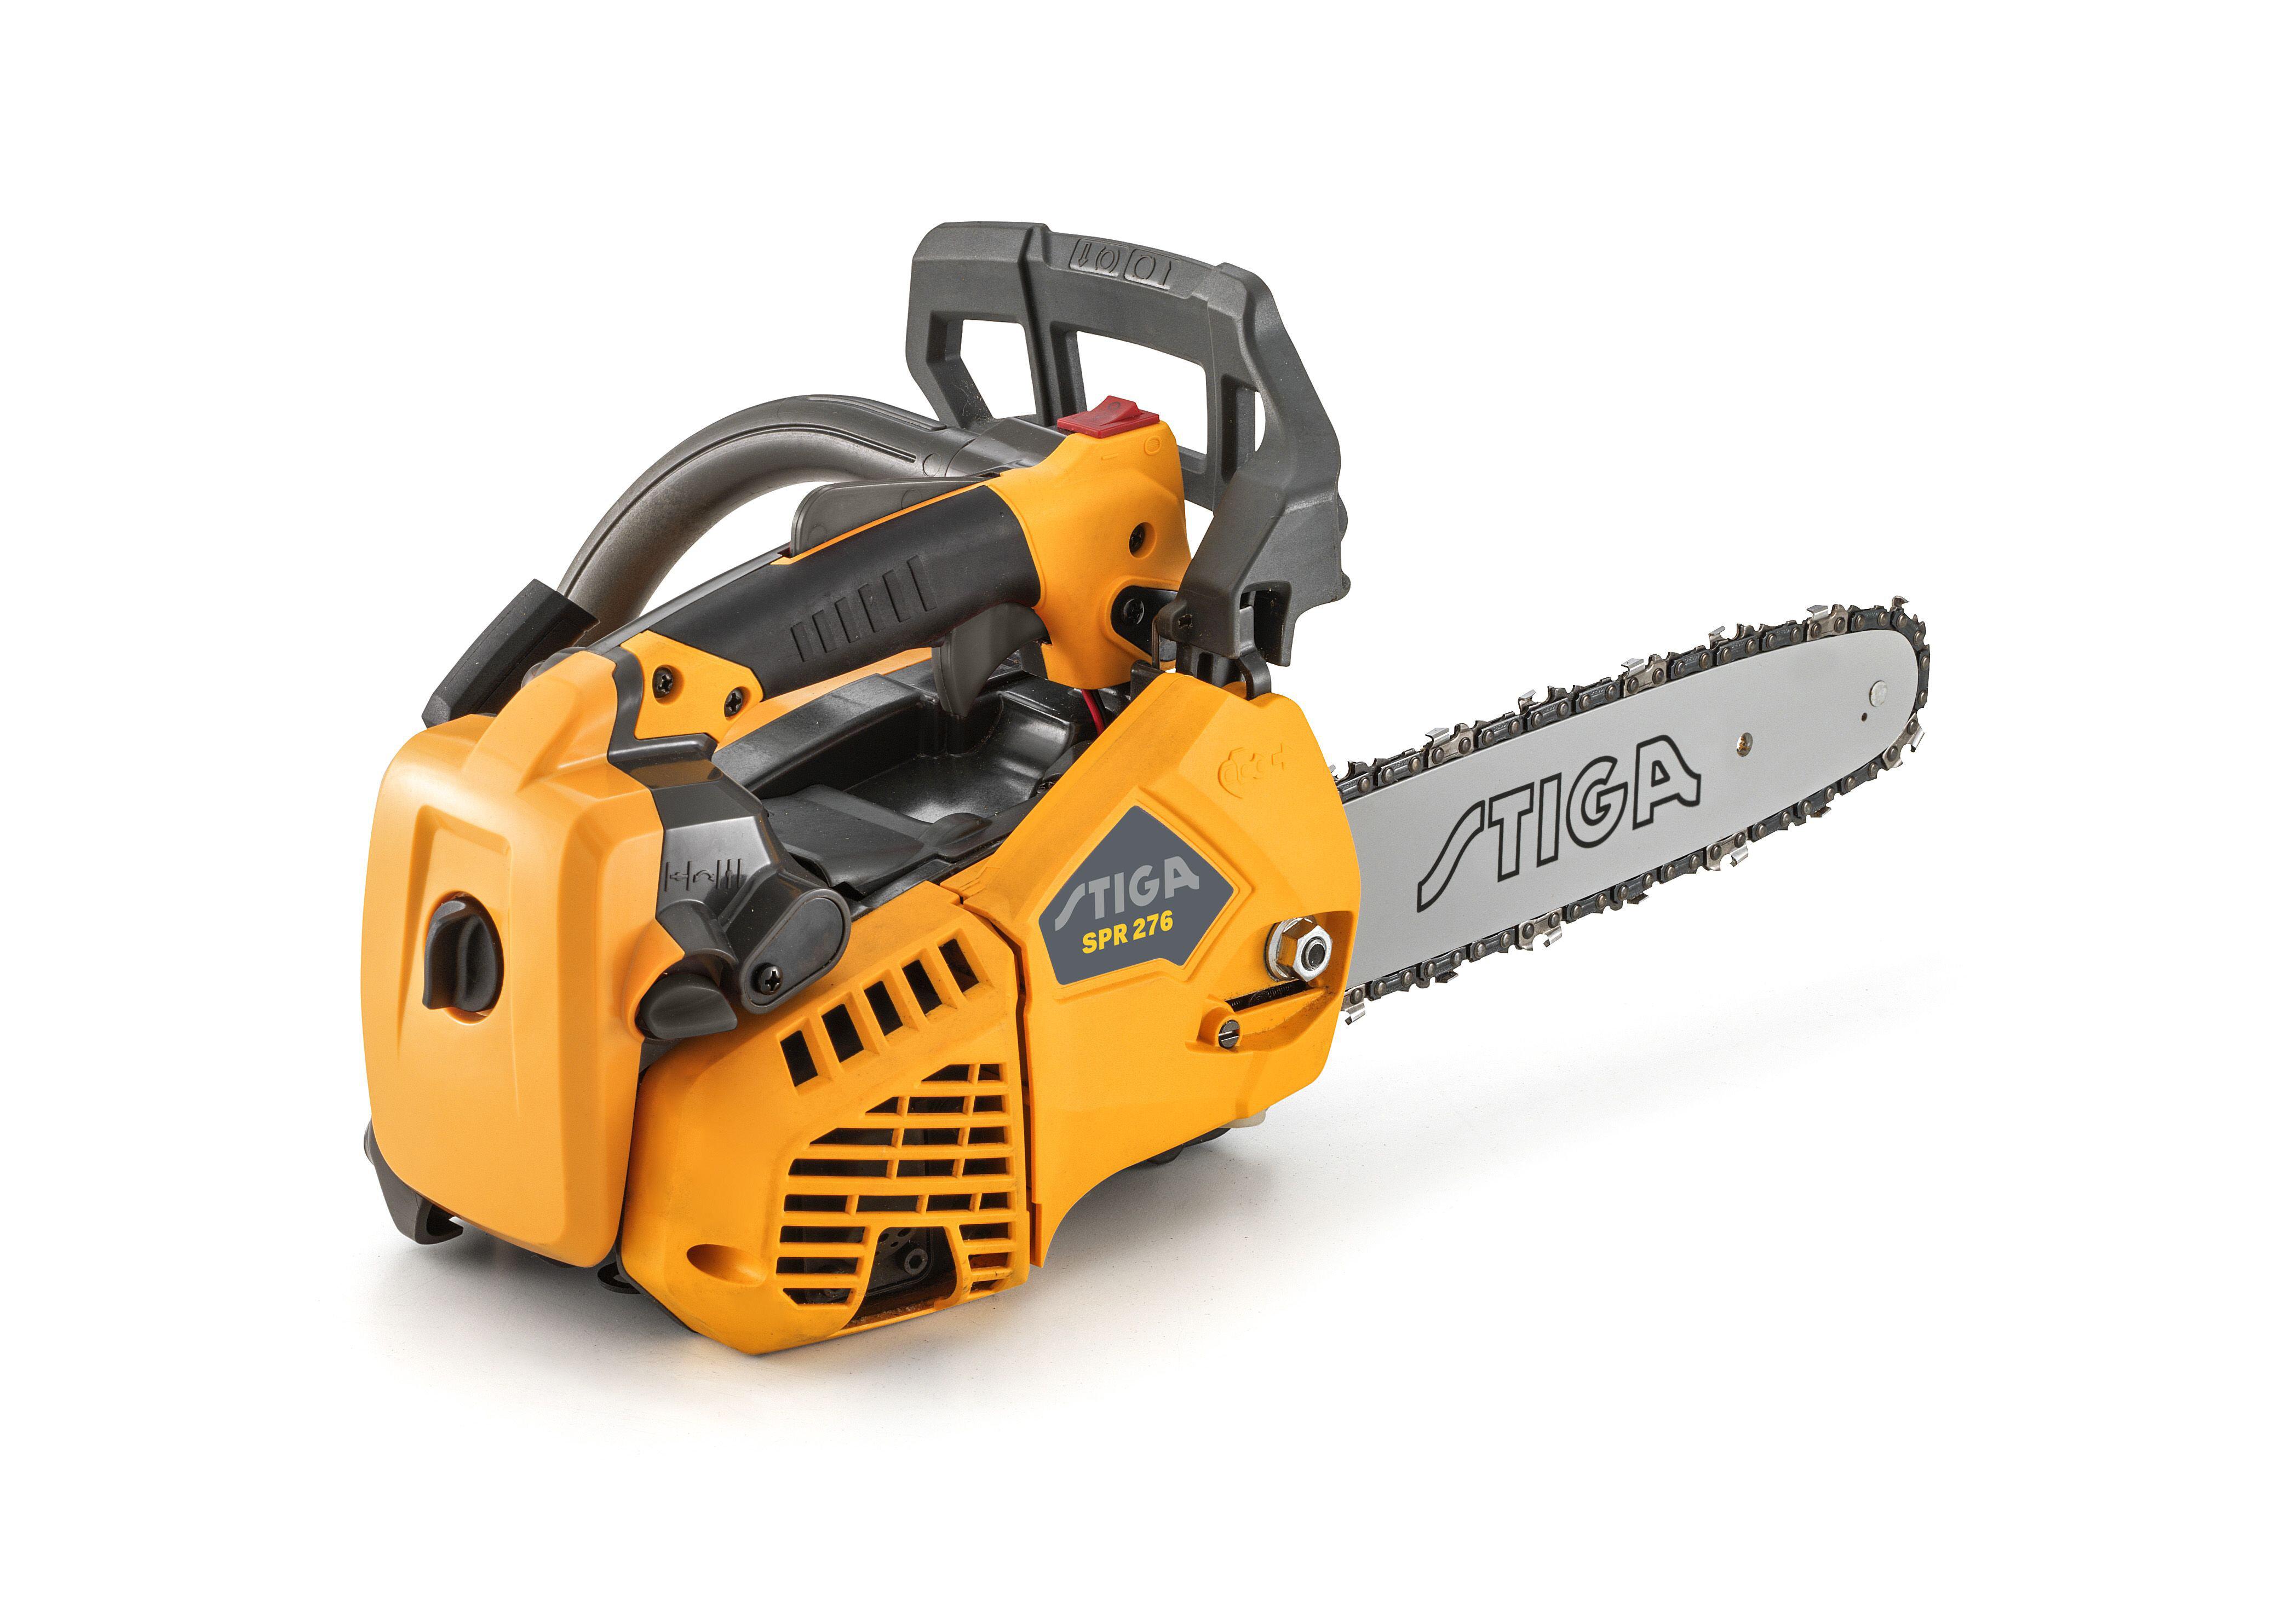 SPR276 STIGA Chainsaw